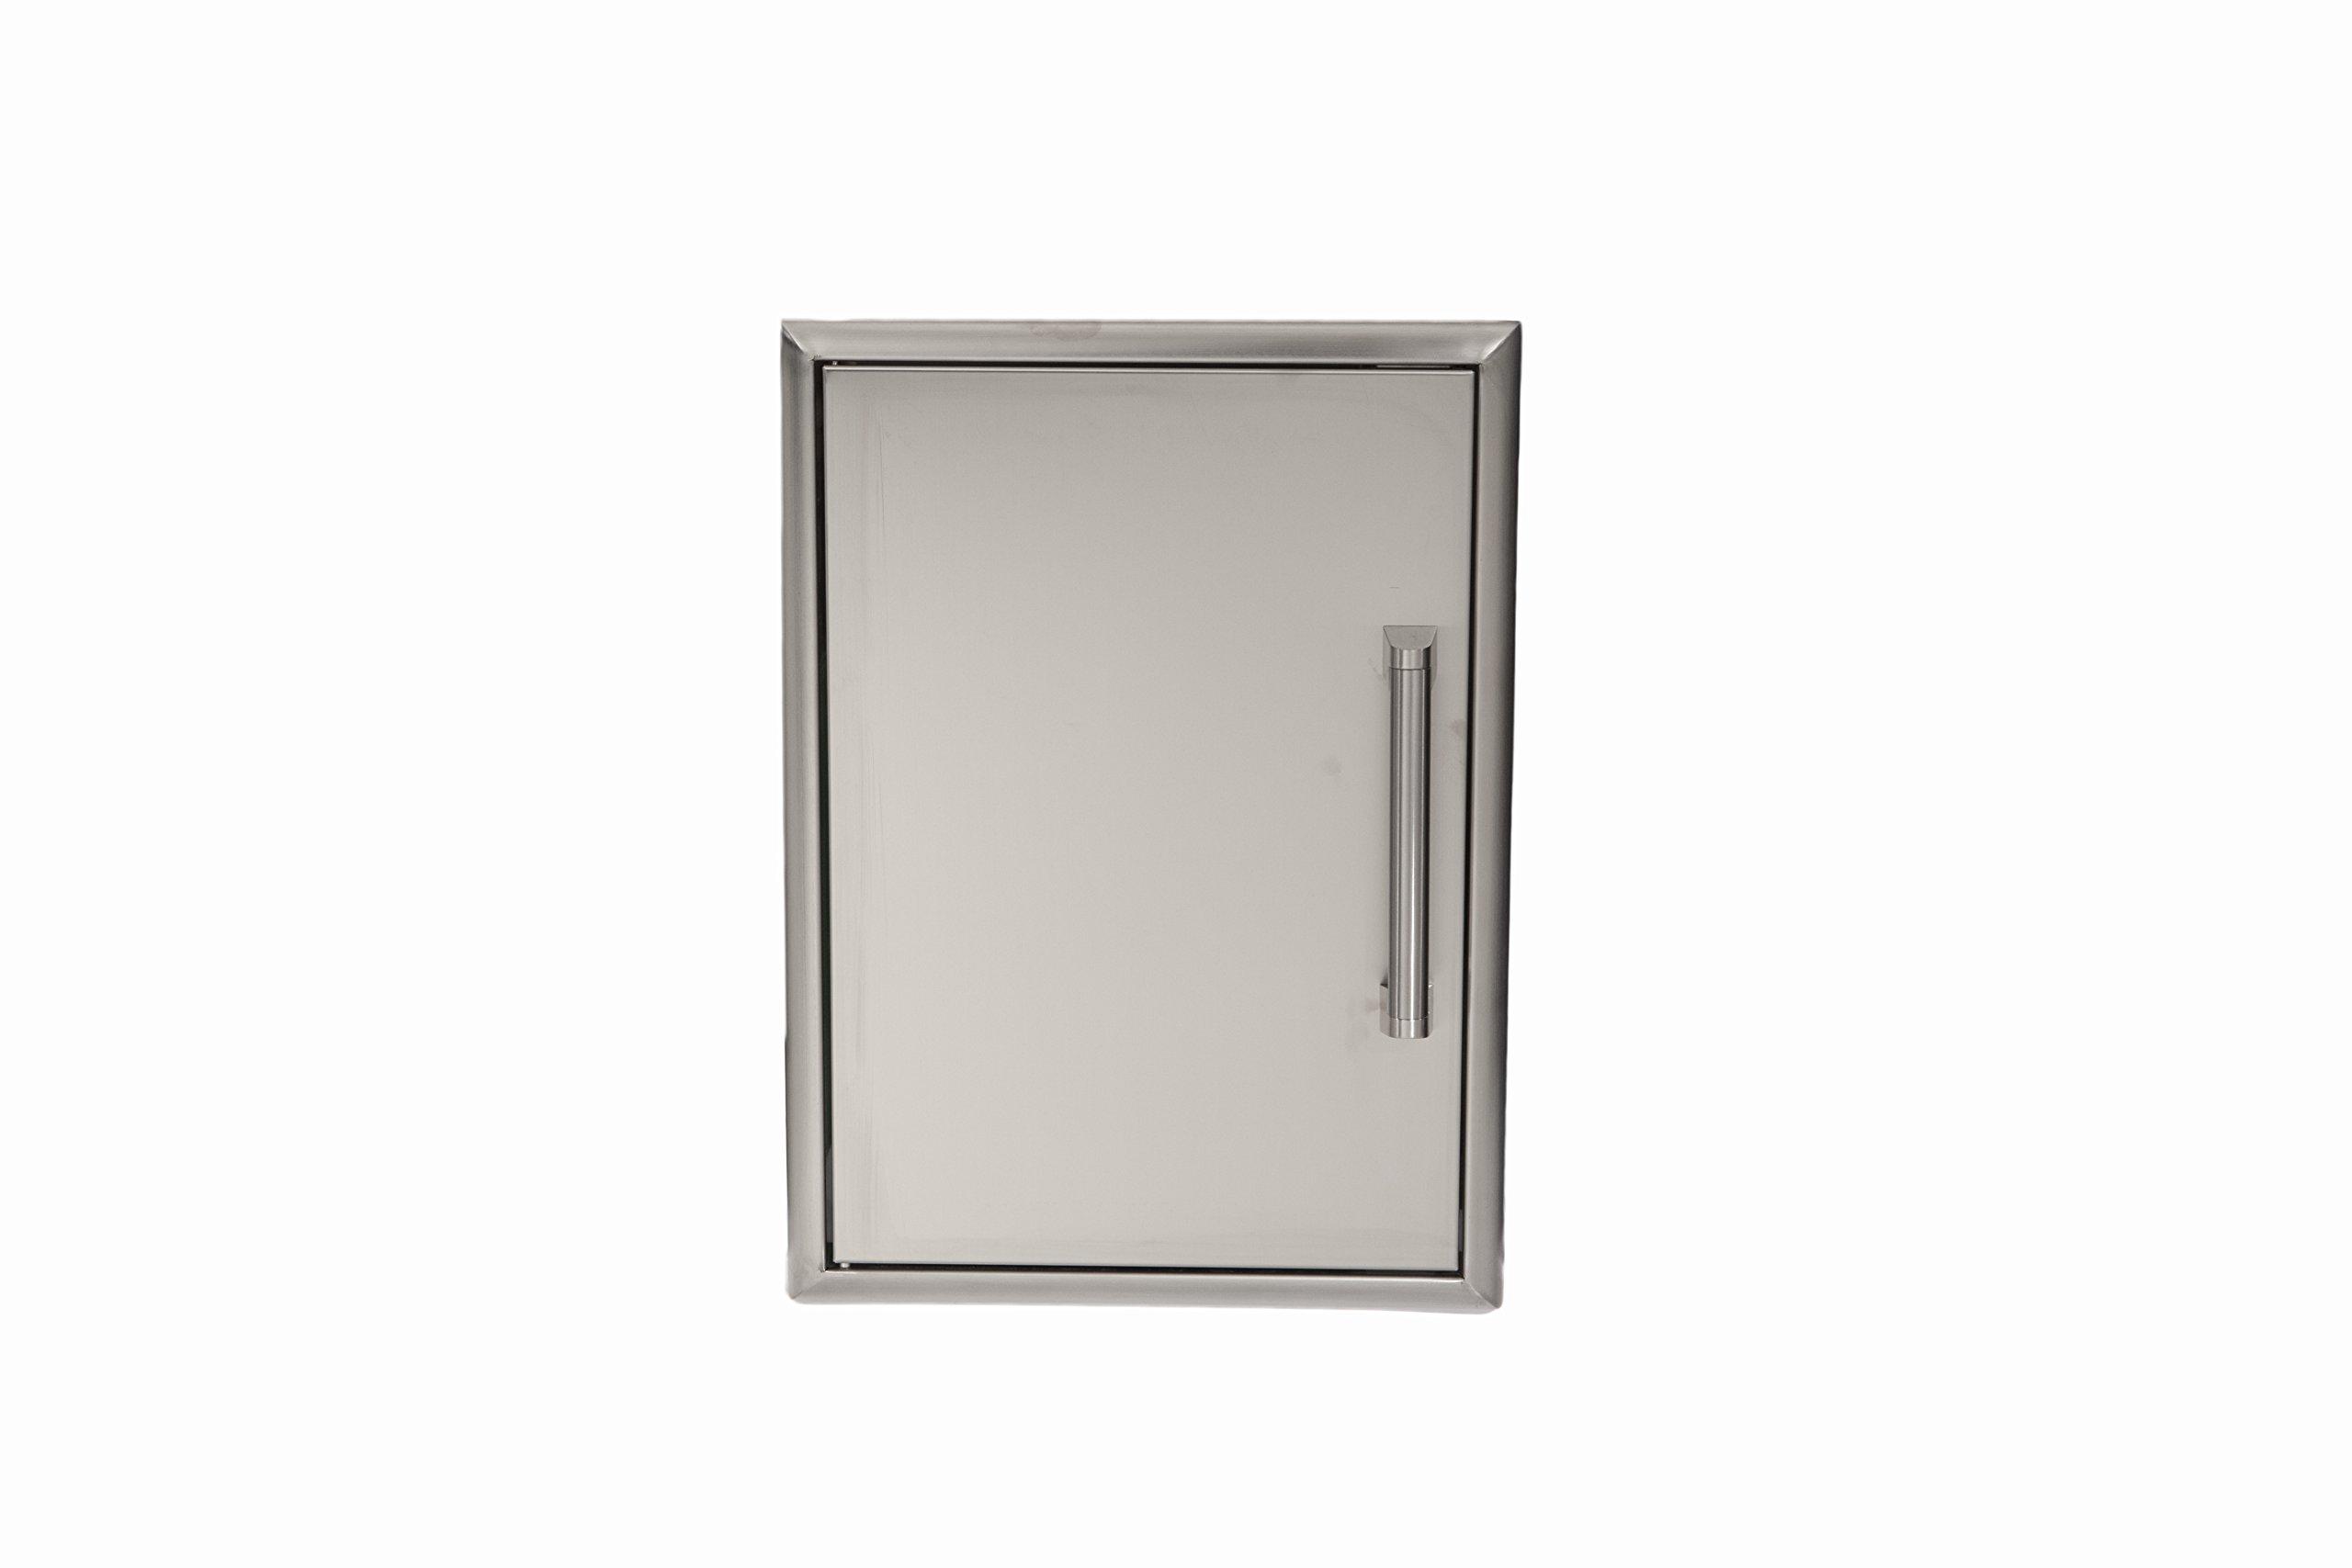 Coyote CSA2014 Single Access Door, 20 by 14-Inch